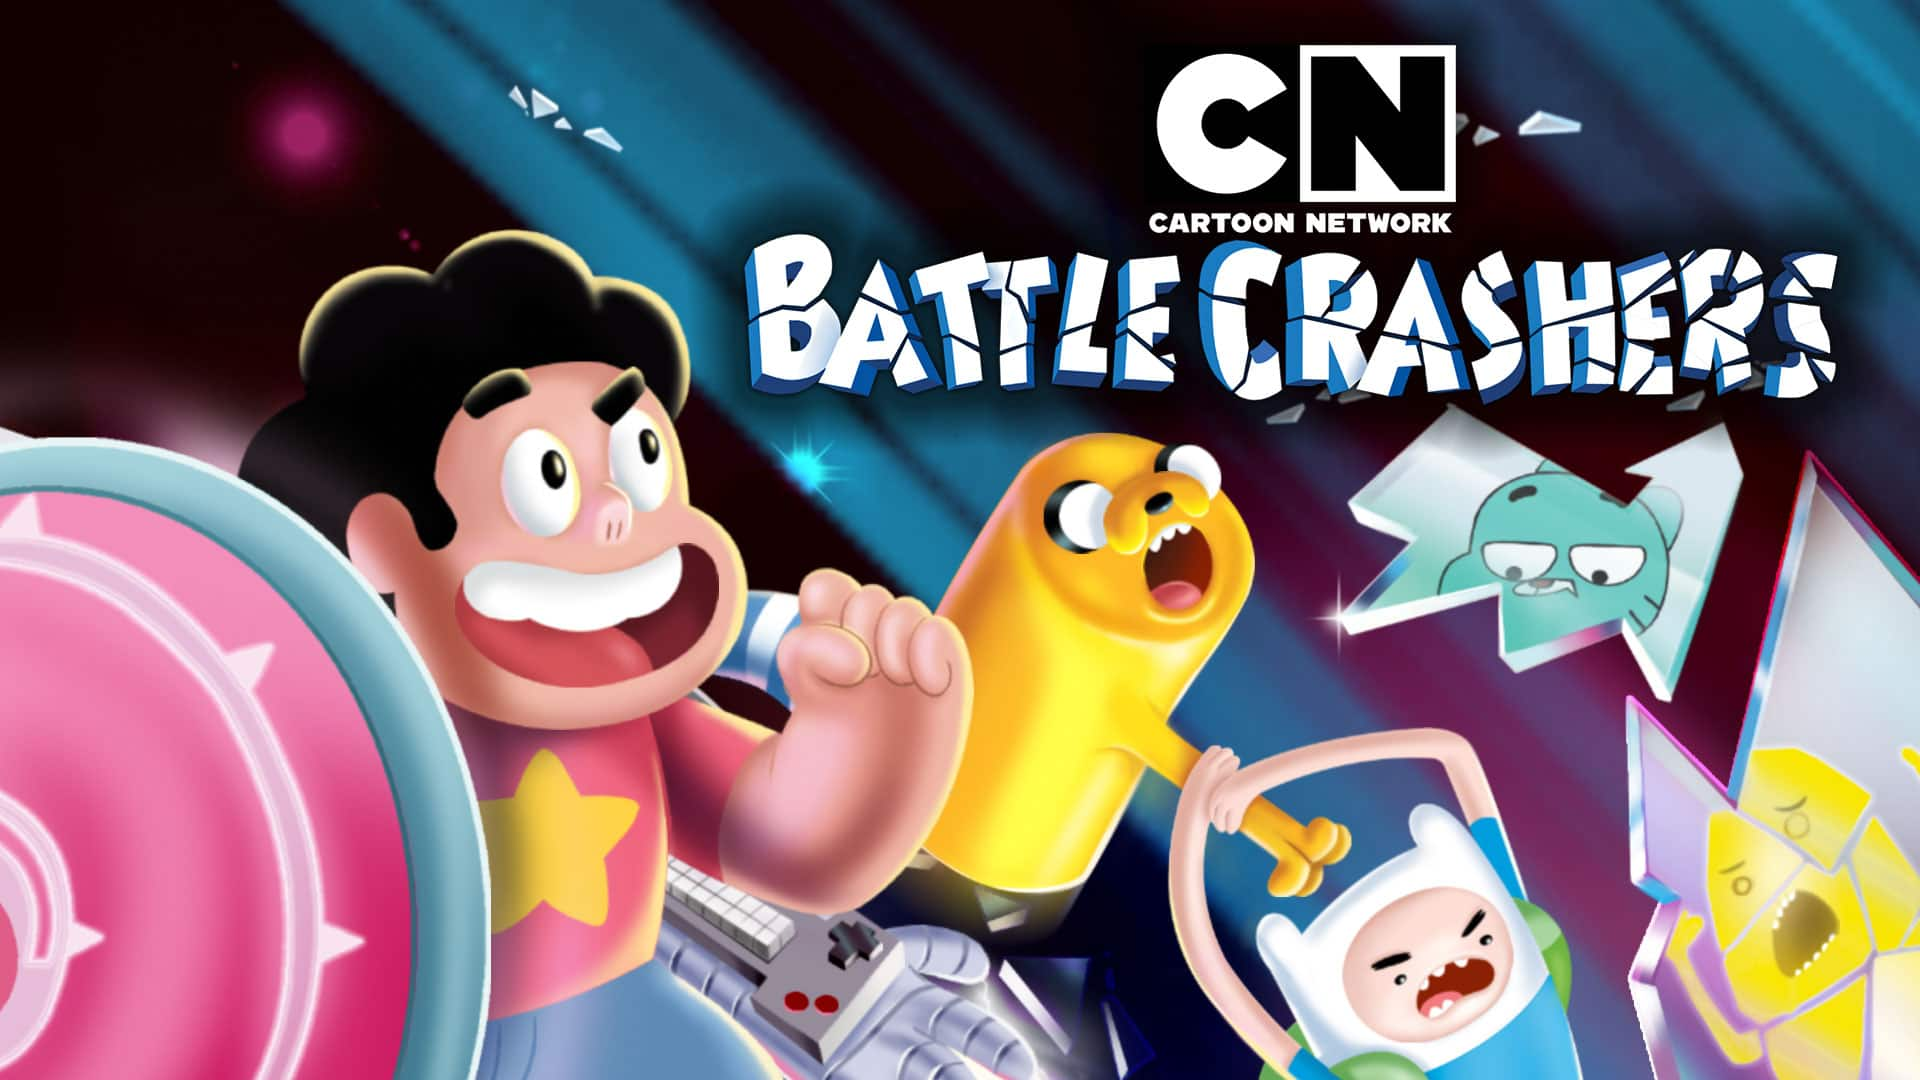 Nintendo Switch Digital Downloads: Cartoon Network: Battle Crashers $2.49, Syberia 2 $1.49, Goosebumps The Game $4.99, Silence $3.99, & More